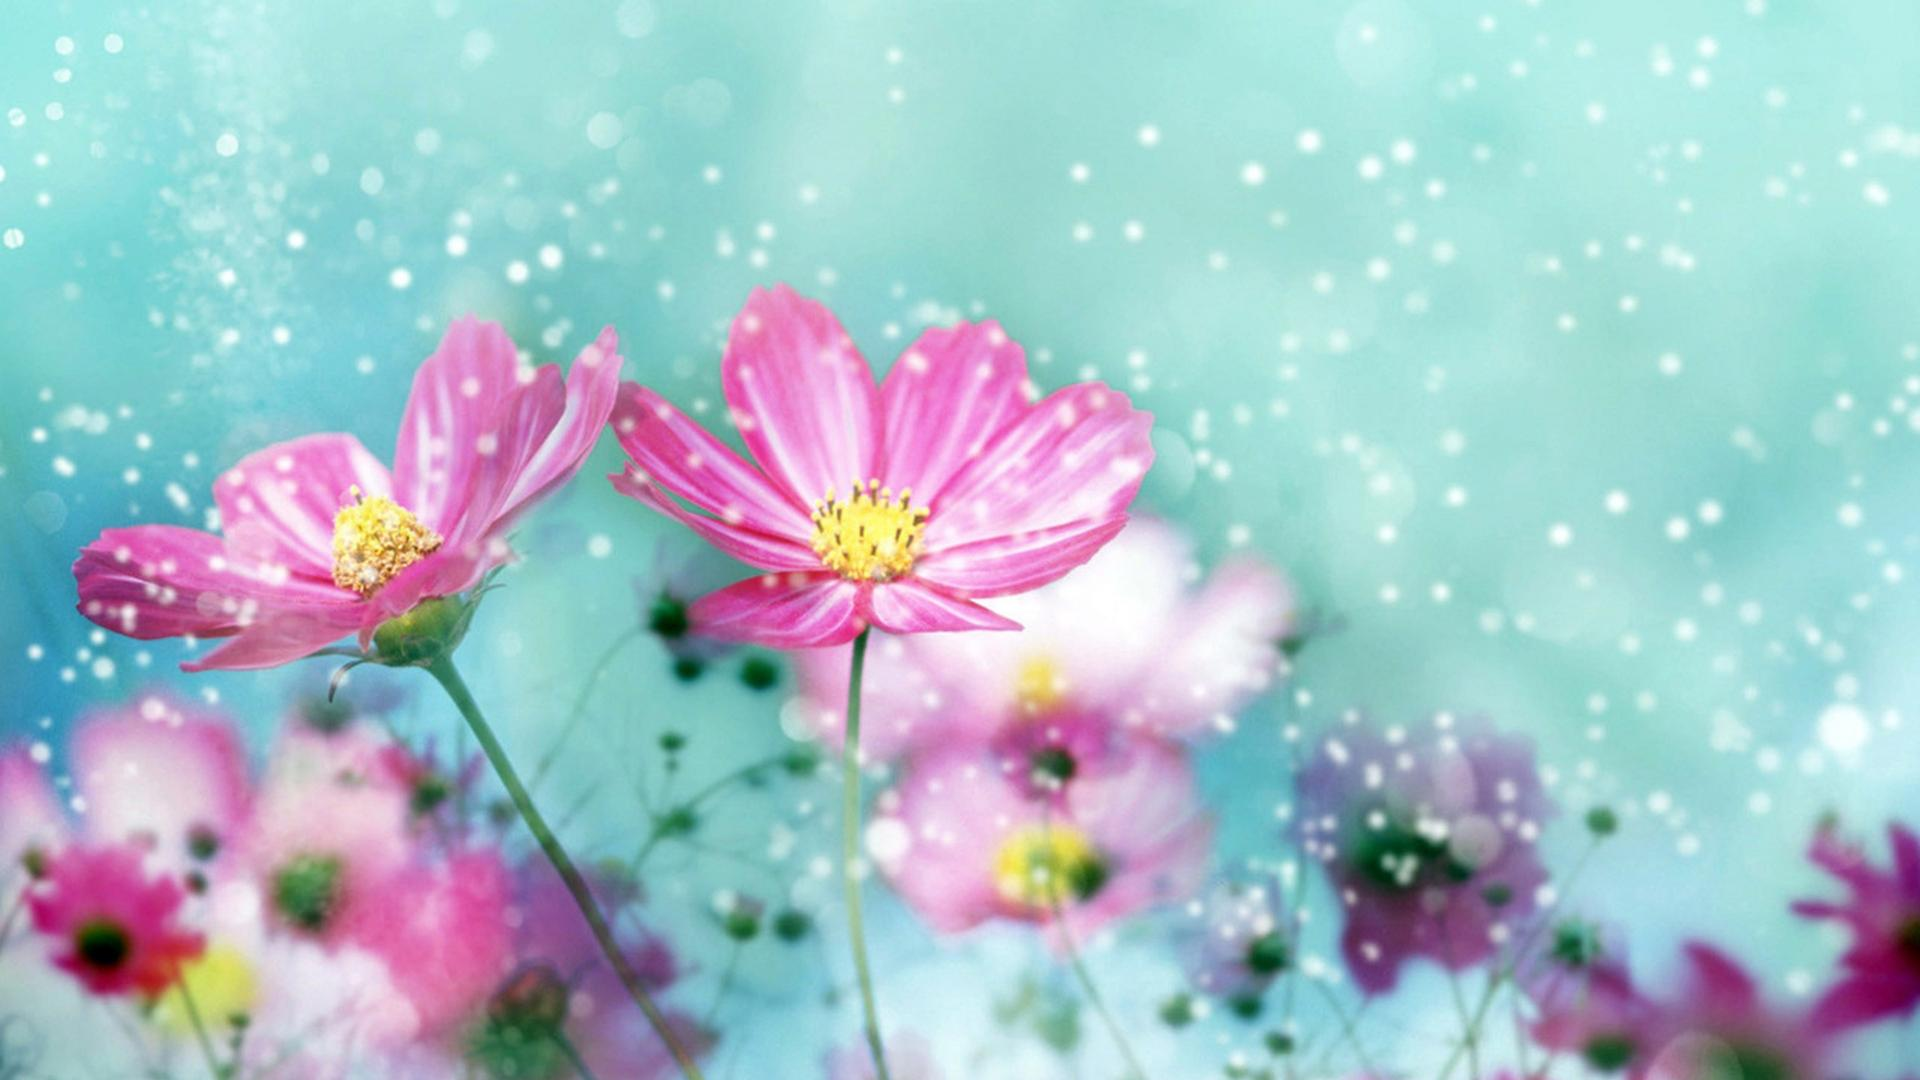 Cute Flower Wallpapers Top Free Cute Flower Backgrounds Wallpaperaccess